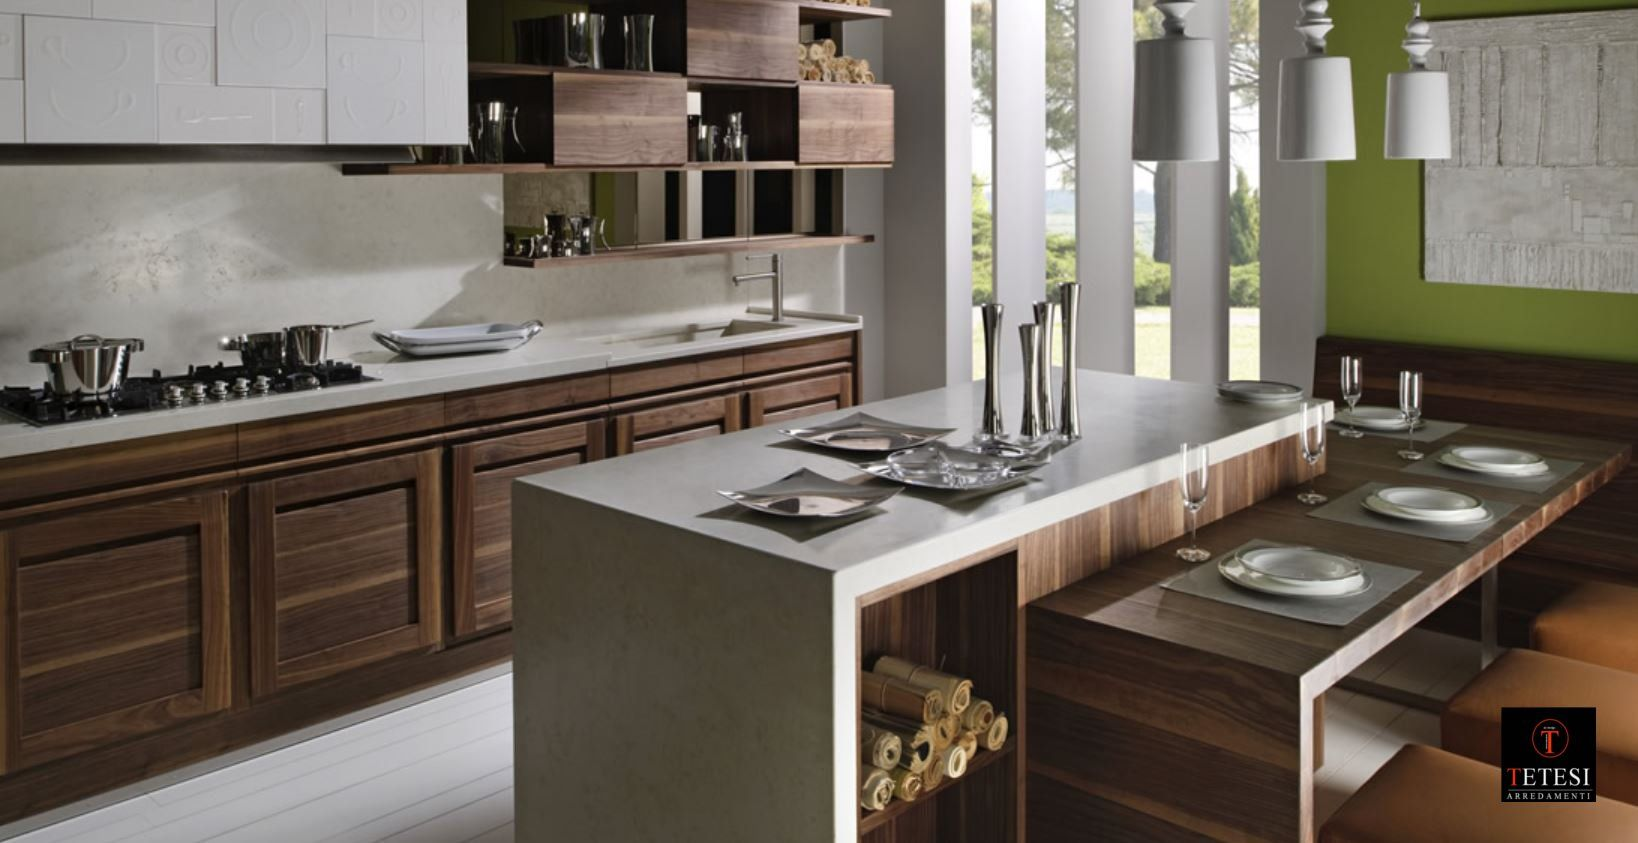 isole cucina con tavolo - Google Search | isole | Kitchen, Kitchen ...